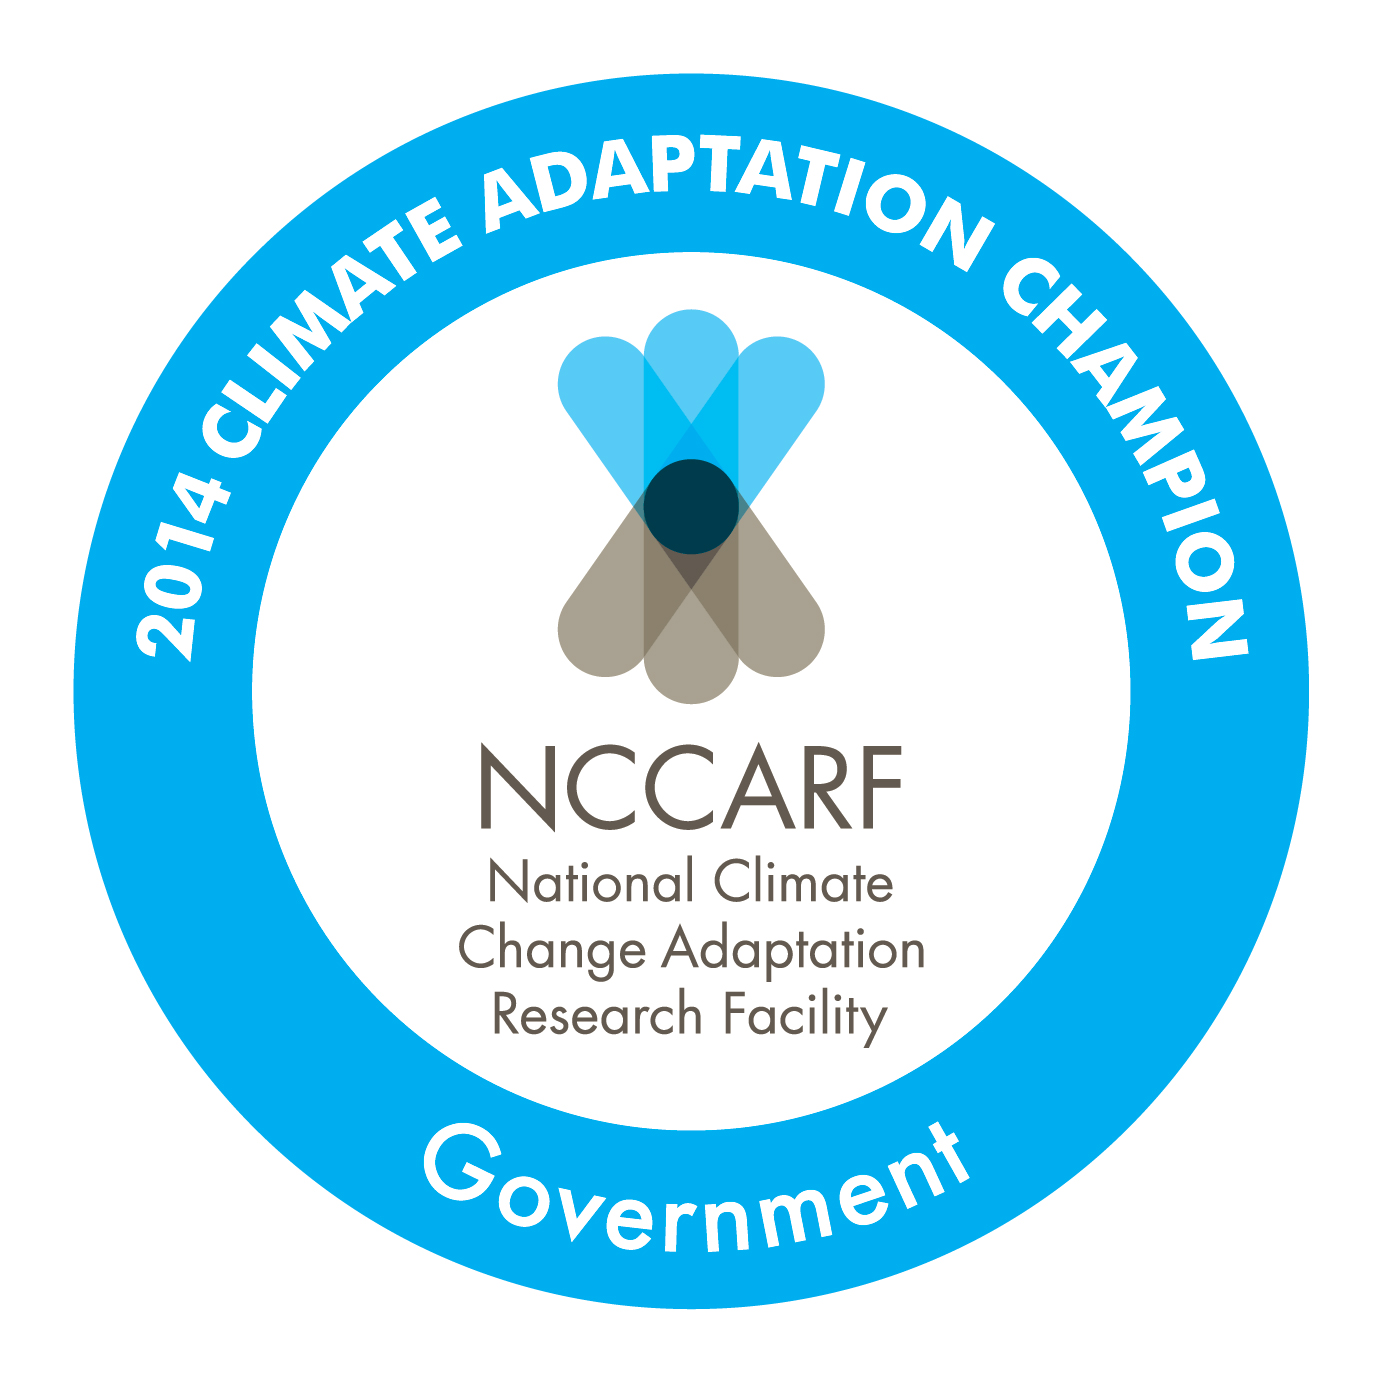 NCCARF CHAMPION AWARD 2014 pg 4.jpg